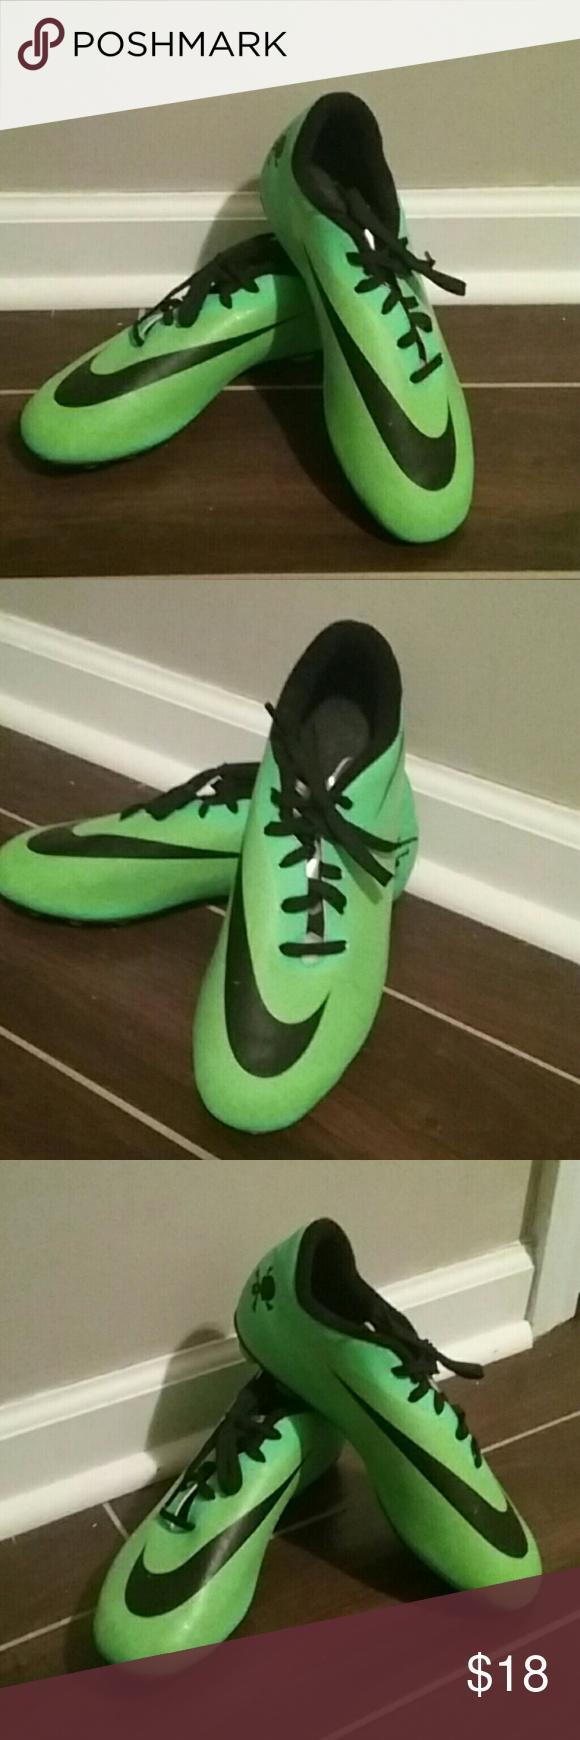 Nike Soccer Cleats My Posh Picks Pinterest Nike Soccer Cleats